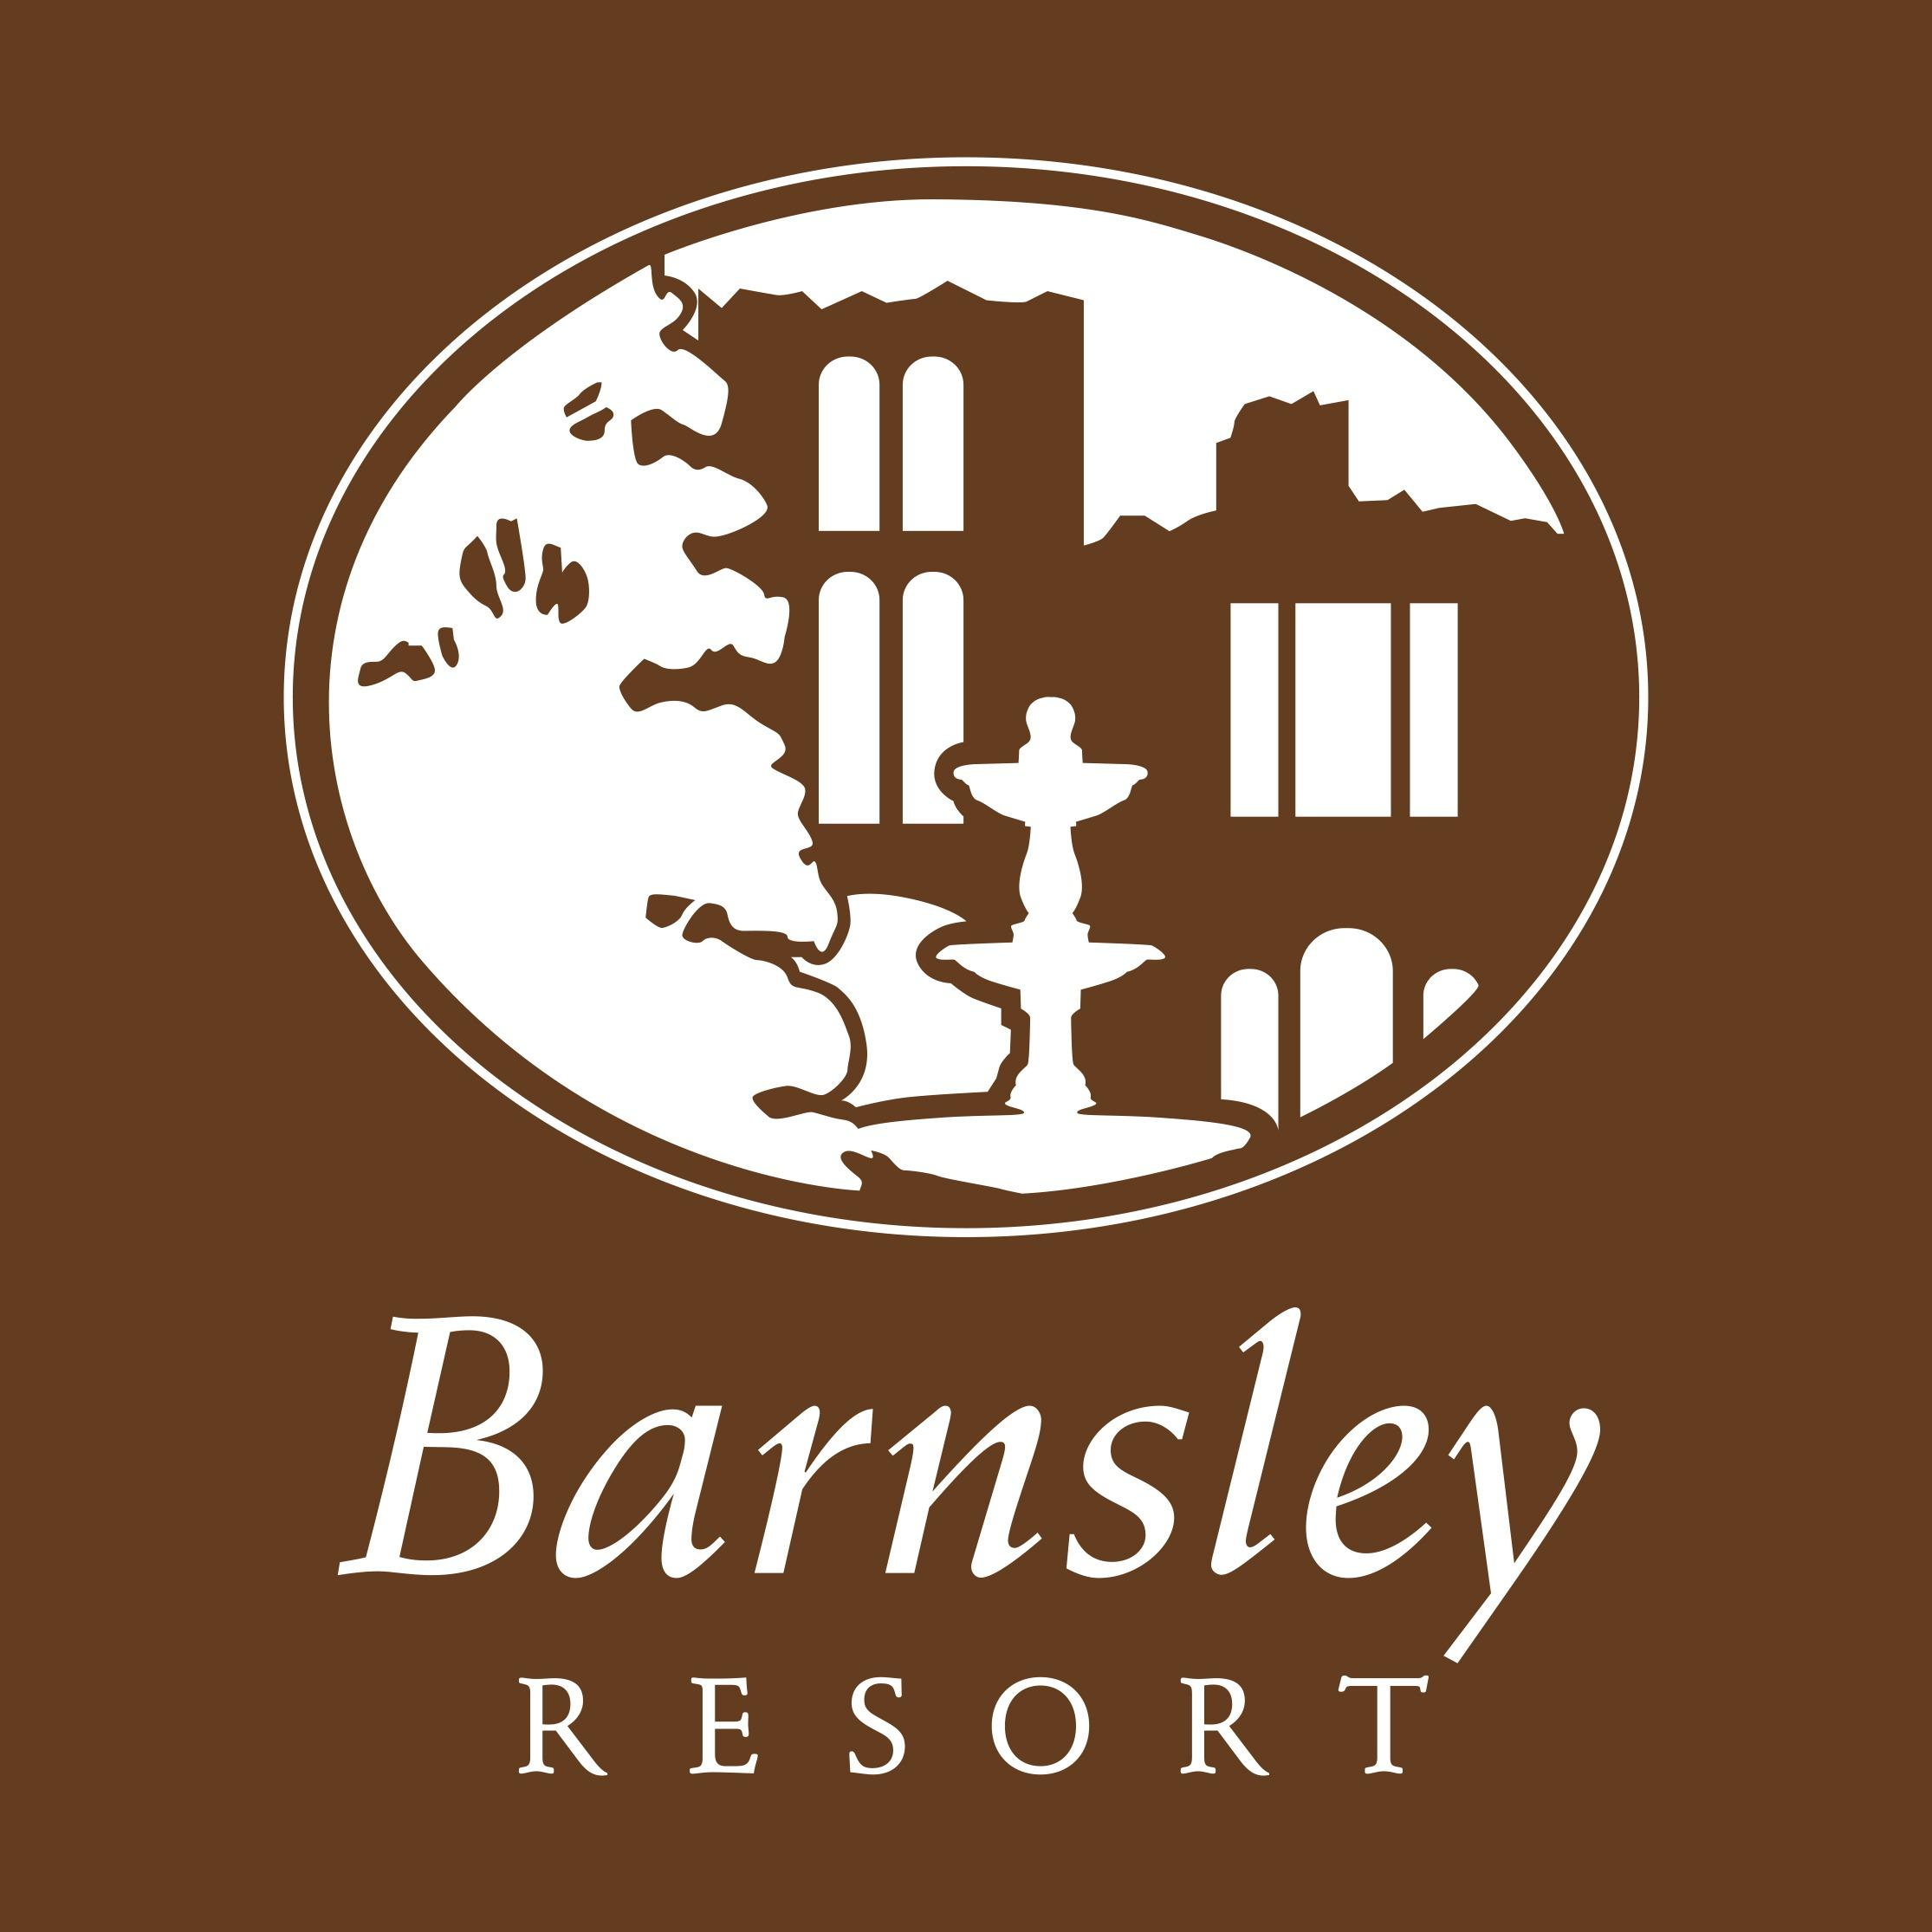 Barnsley Resort image 42